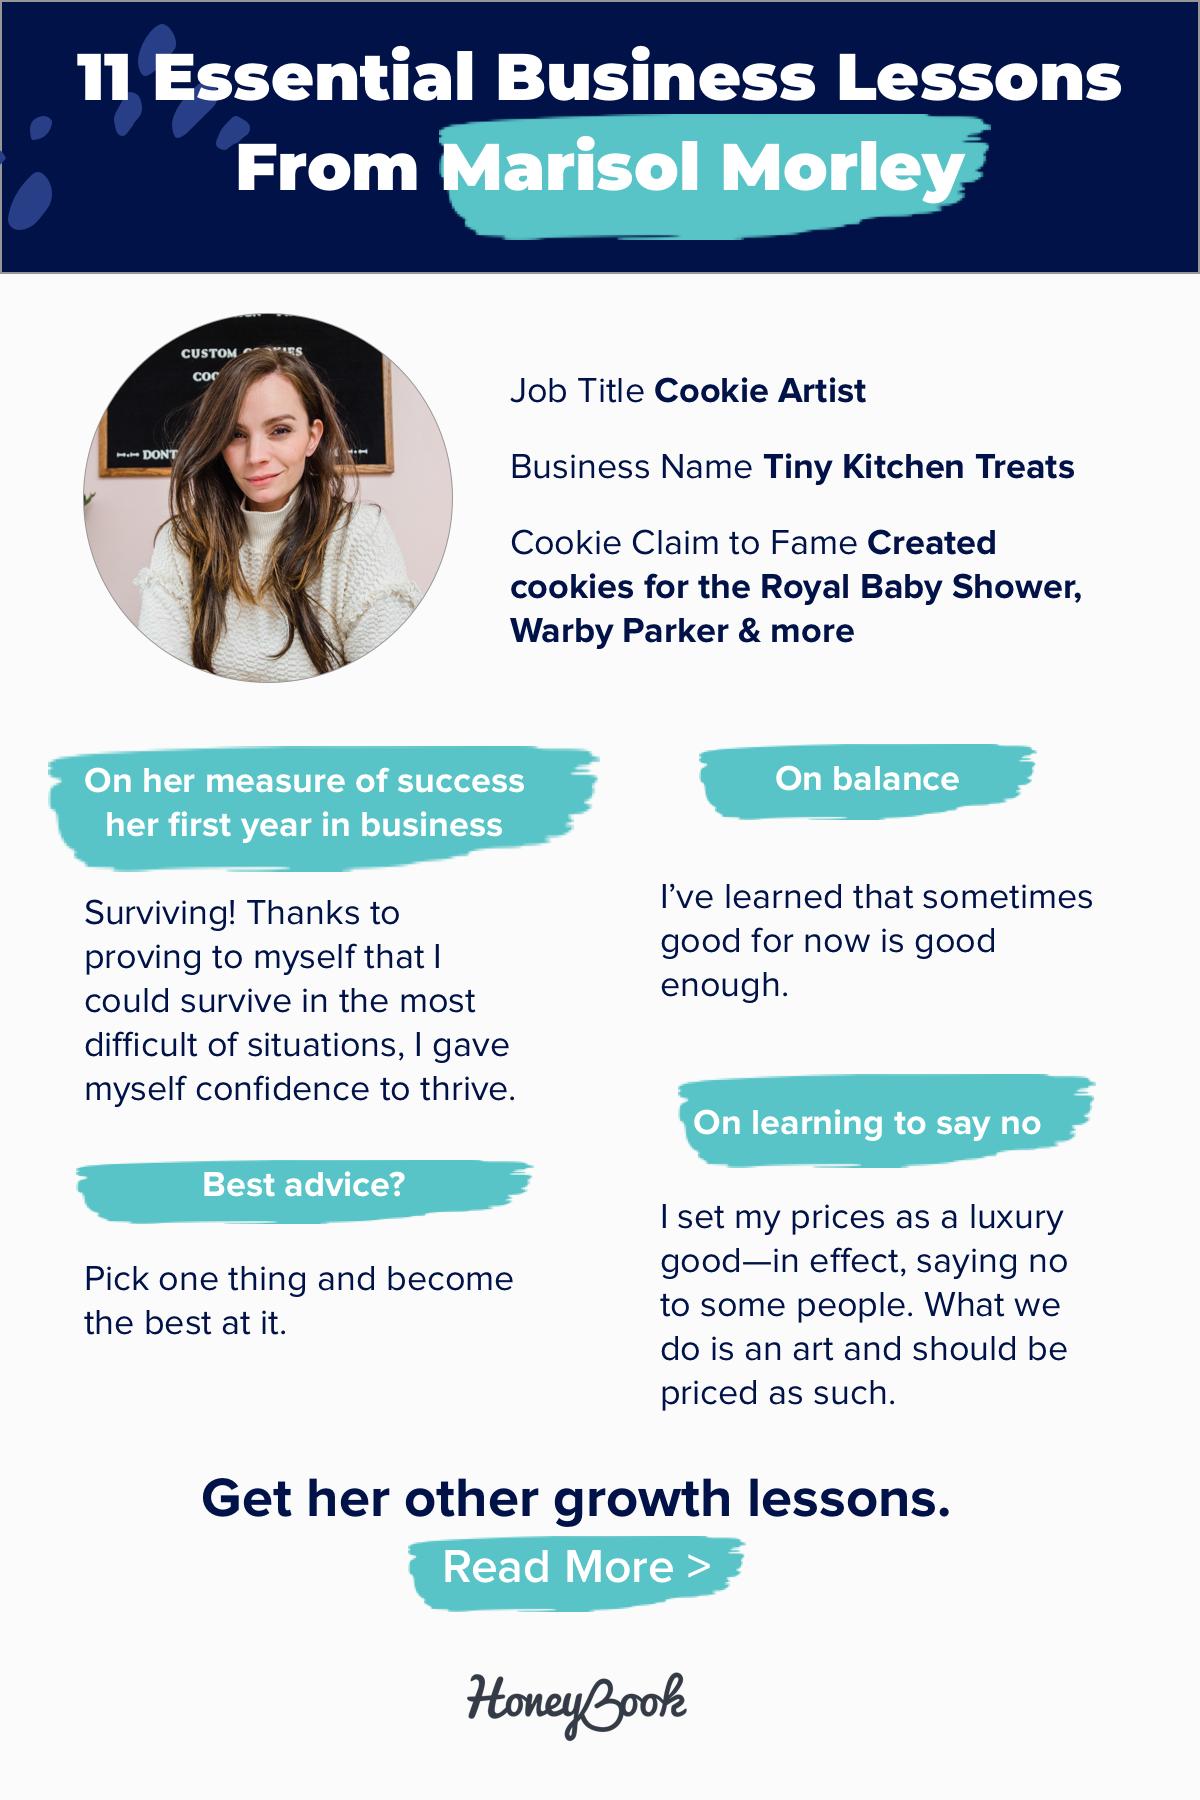 11 Essential Business Lessons From Cookie Artist Marisol Morley Honeybook Instagram Help Business Honeybook